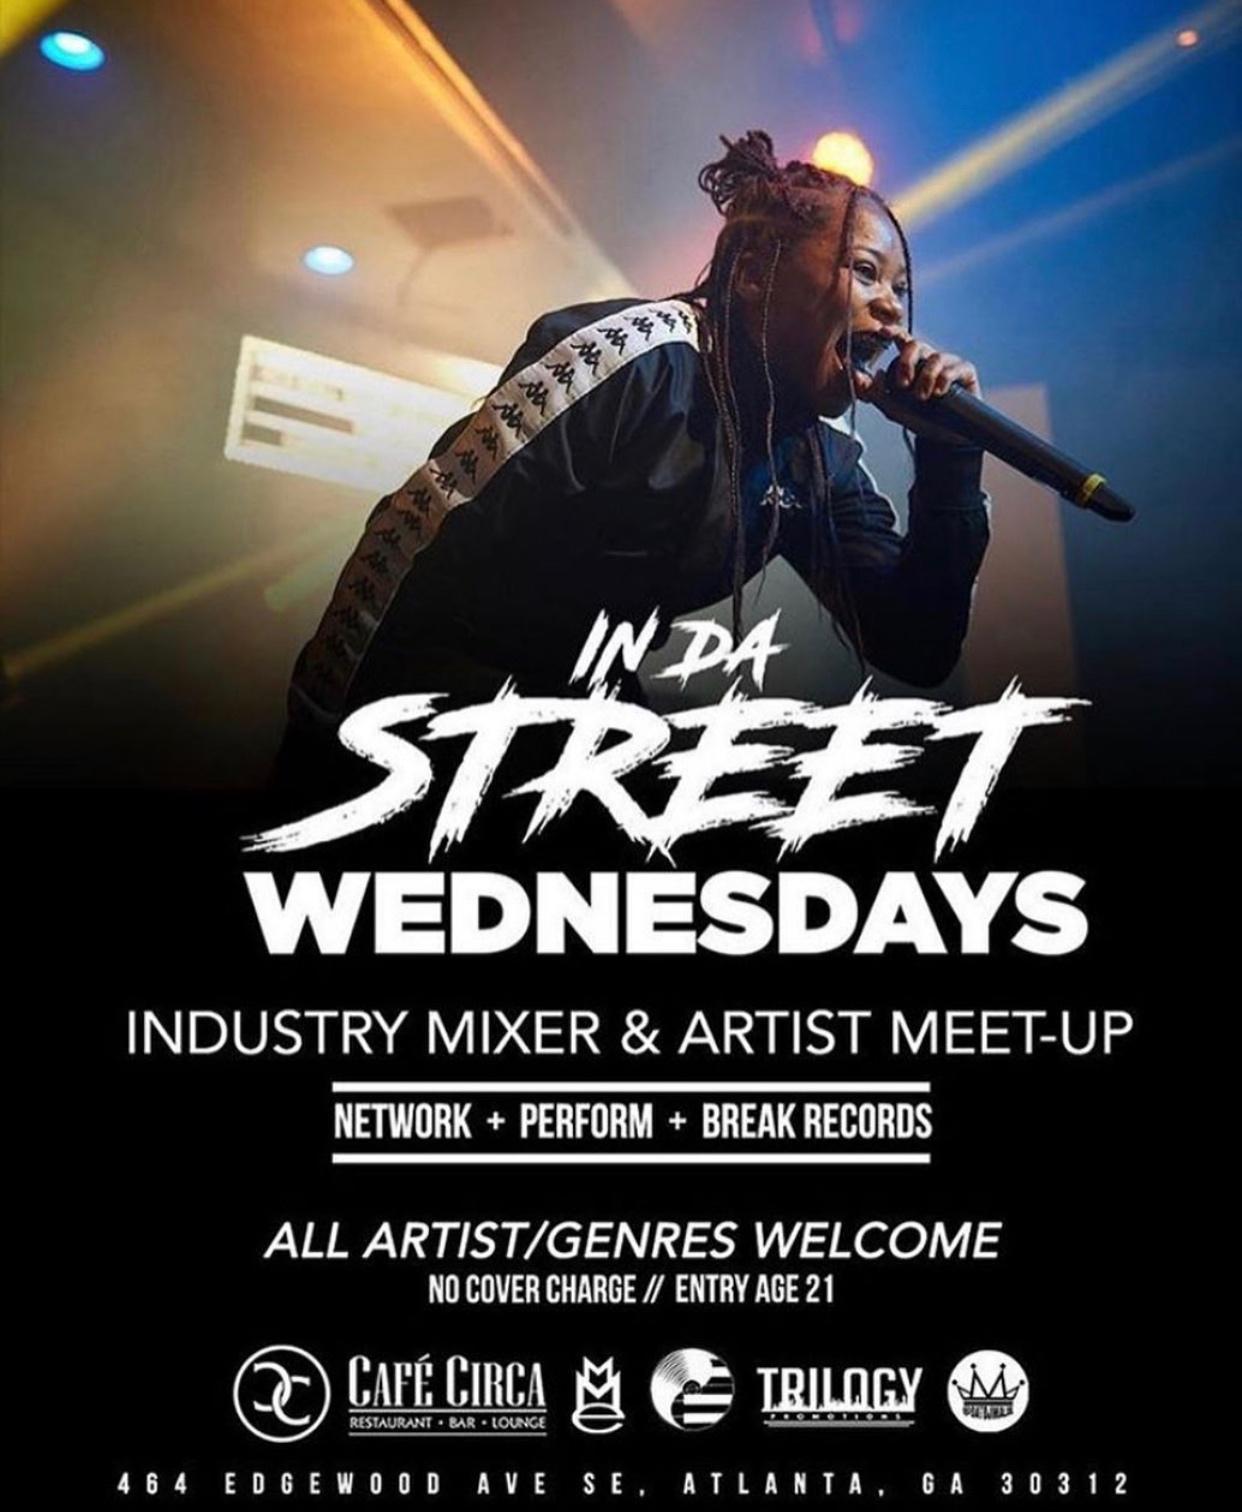 In Da Street Wednesdays